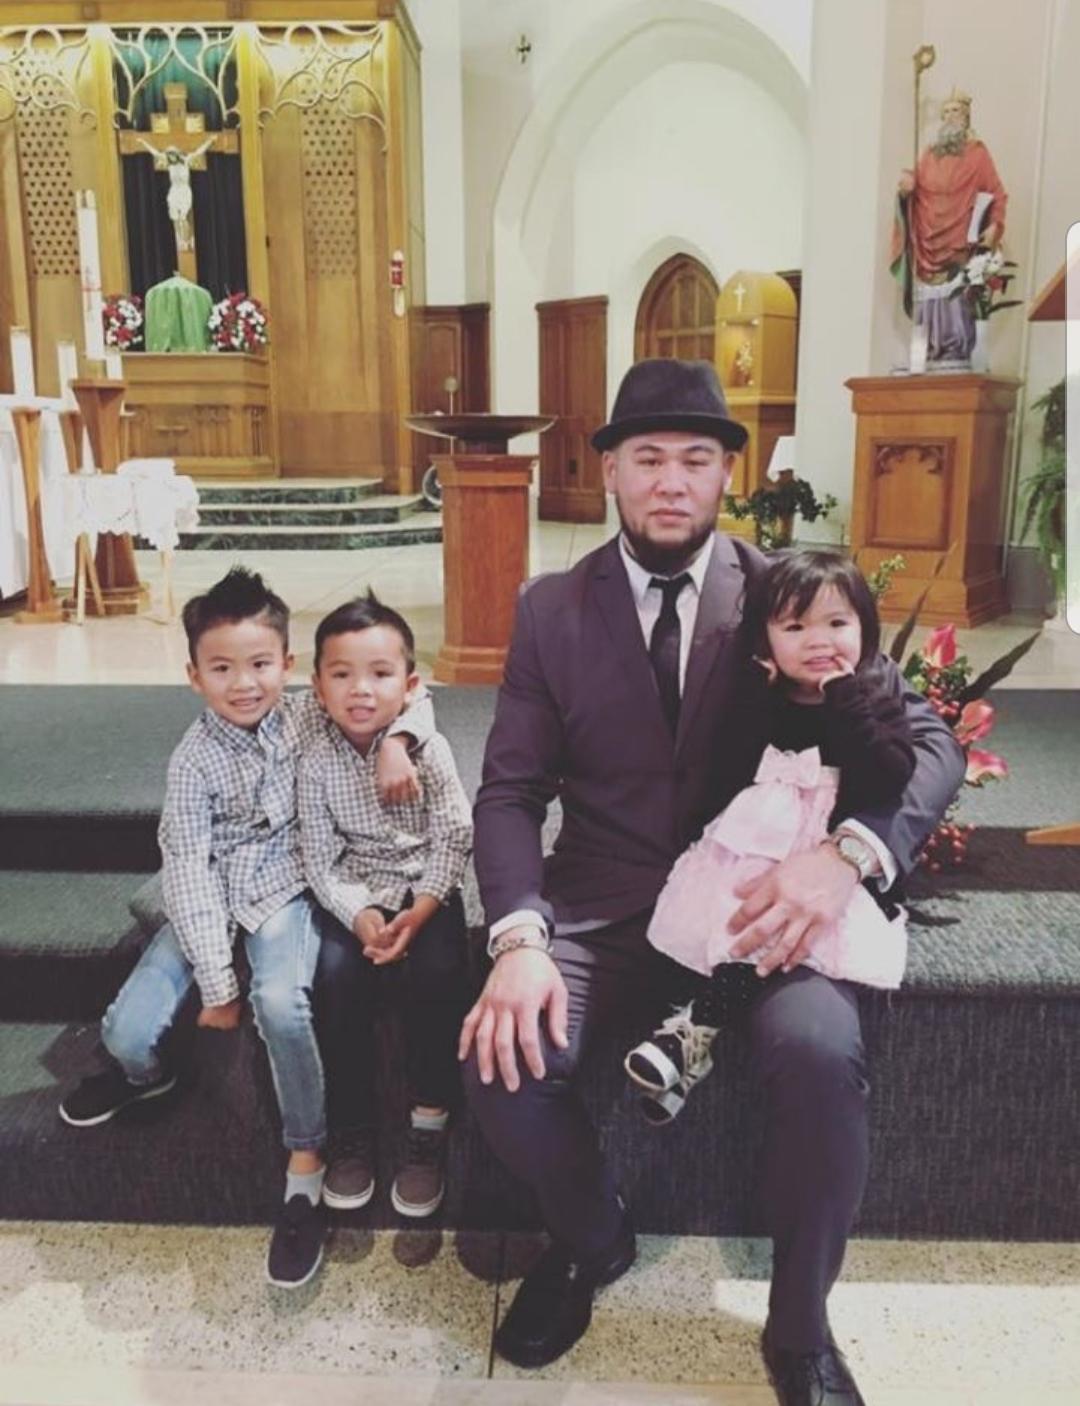 David Smart with his kids